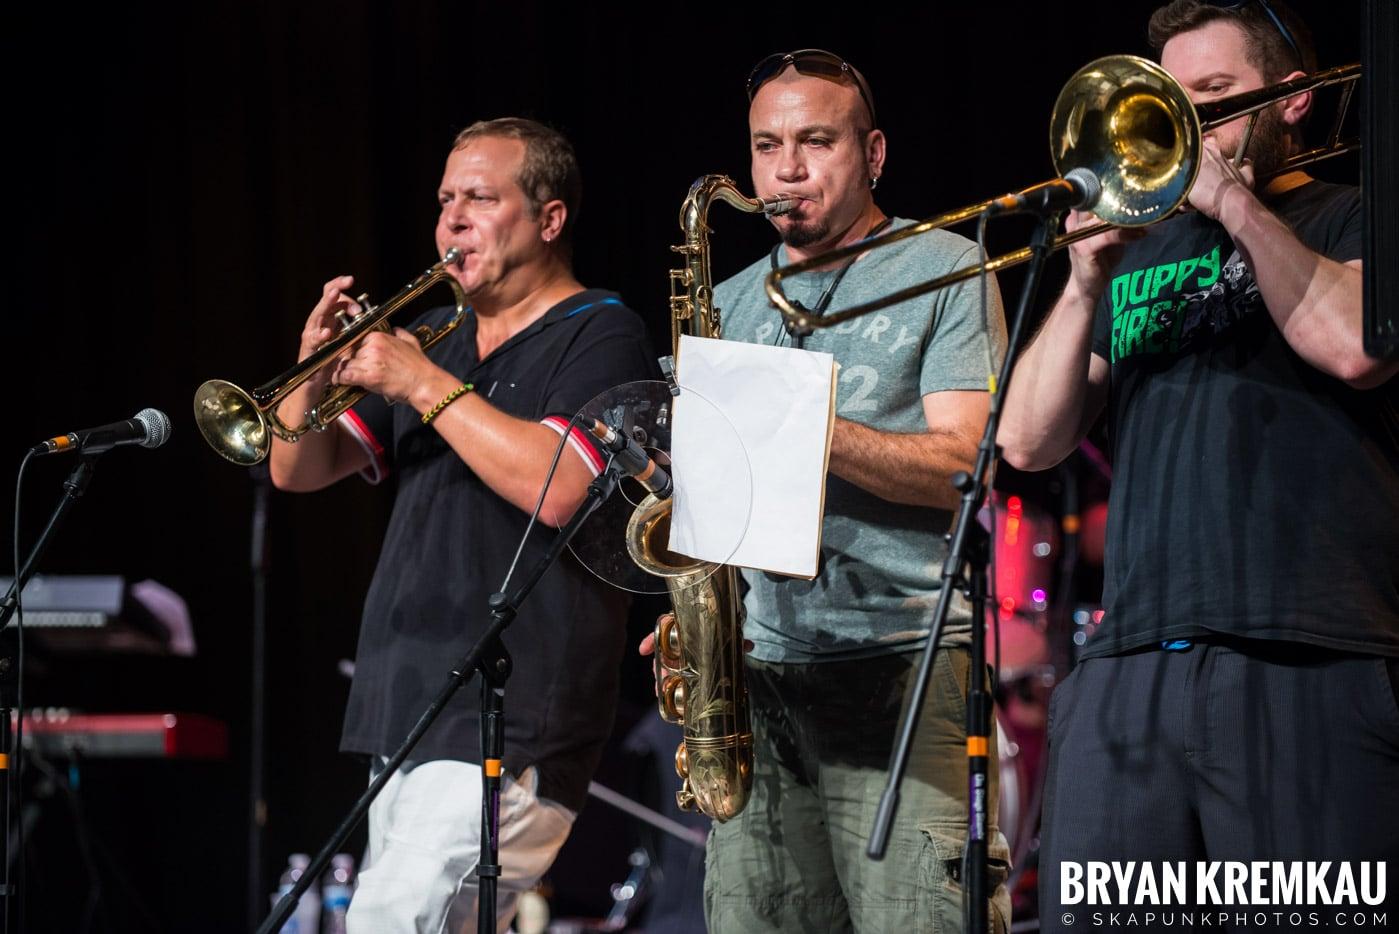 The Rudie Crew @ Oskar Schindler Performing Arts Center, West Orange, NJ - 8.19.17 (2)